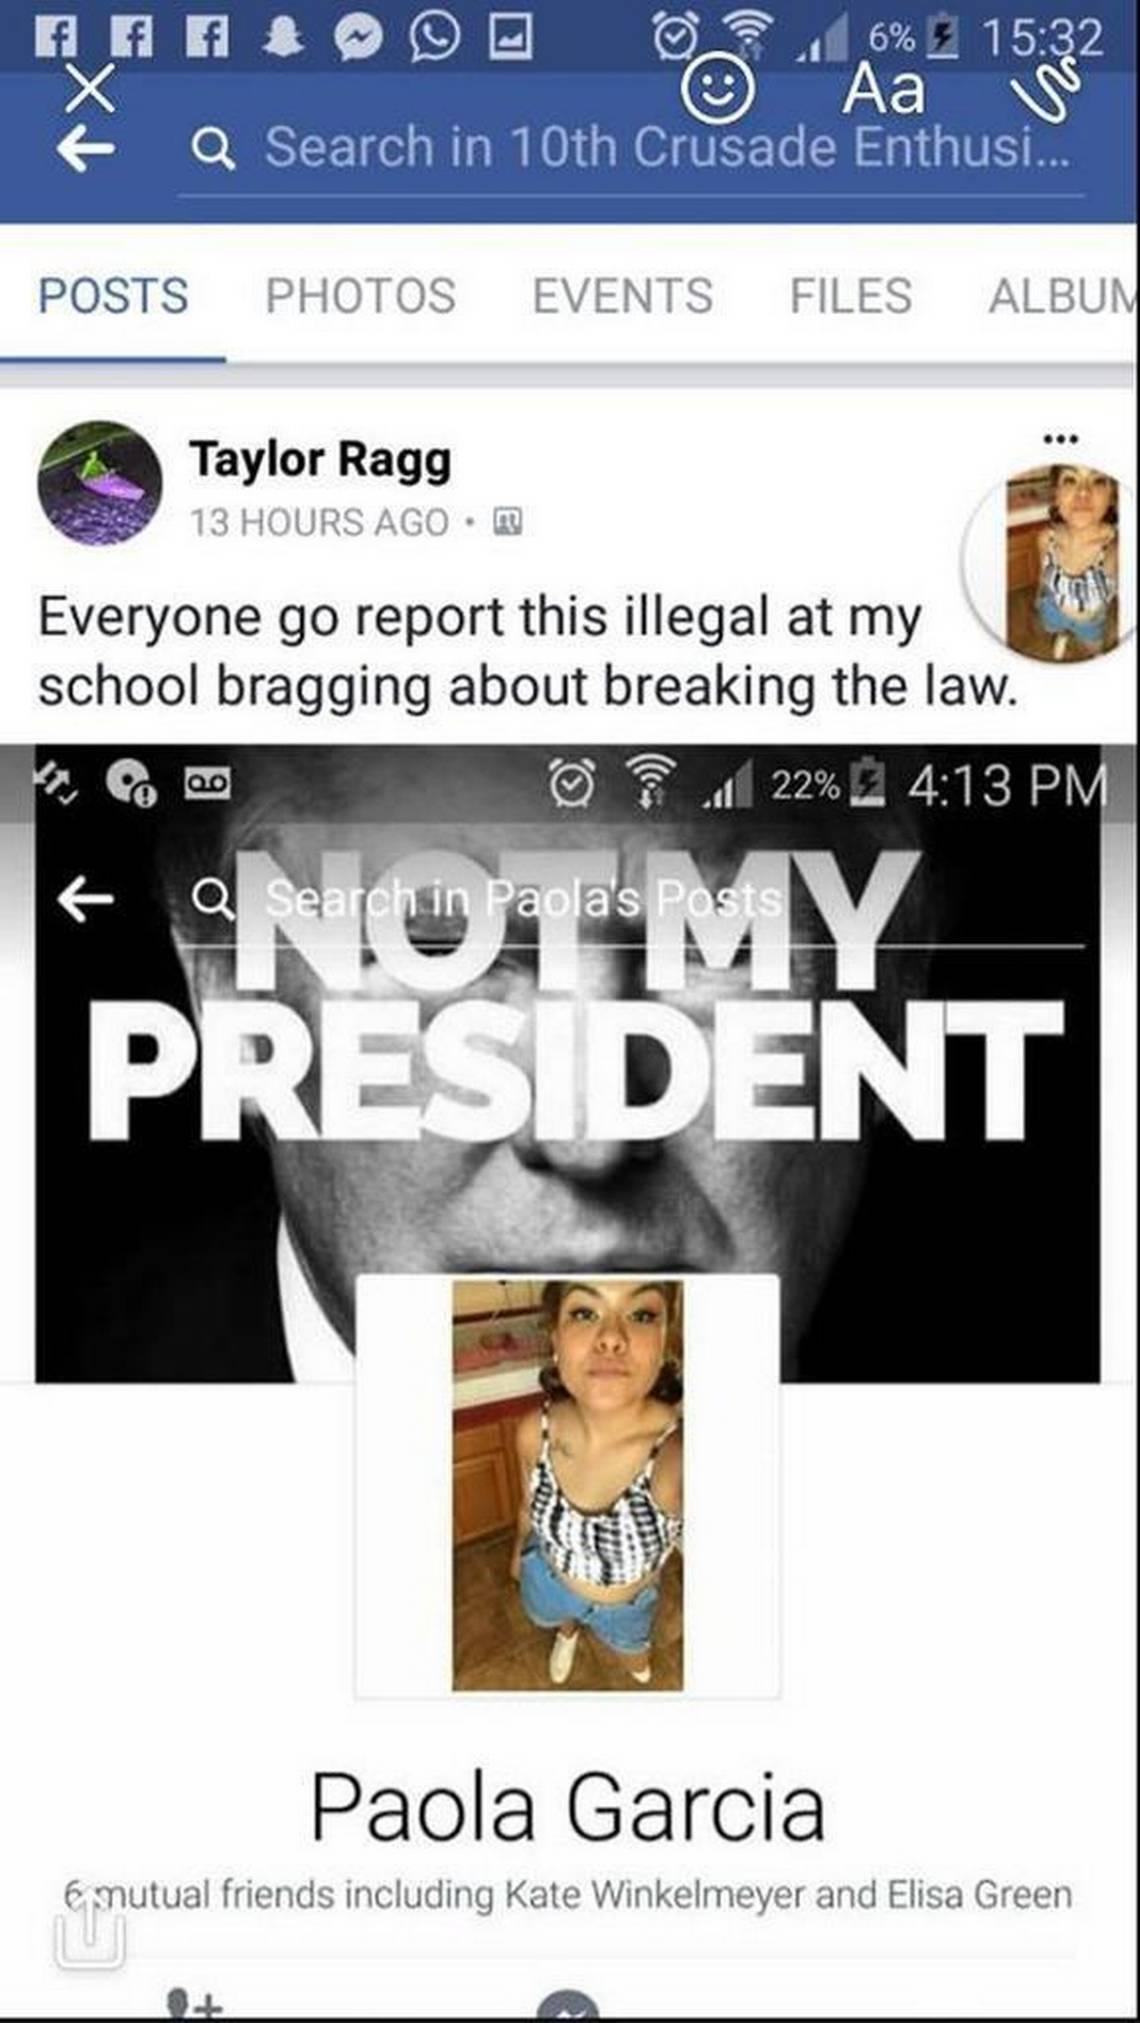 Taylor Ragg's post